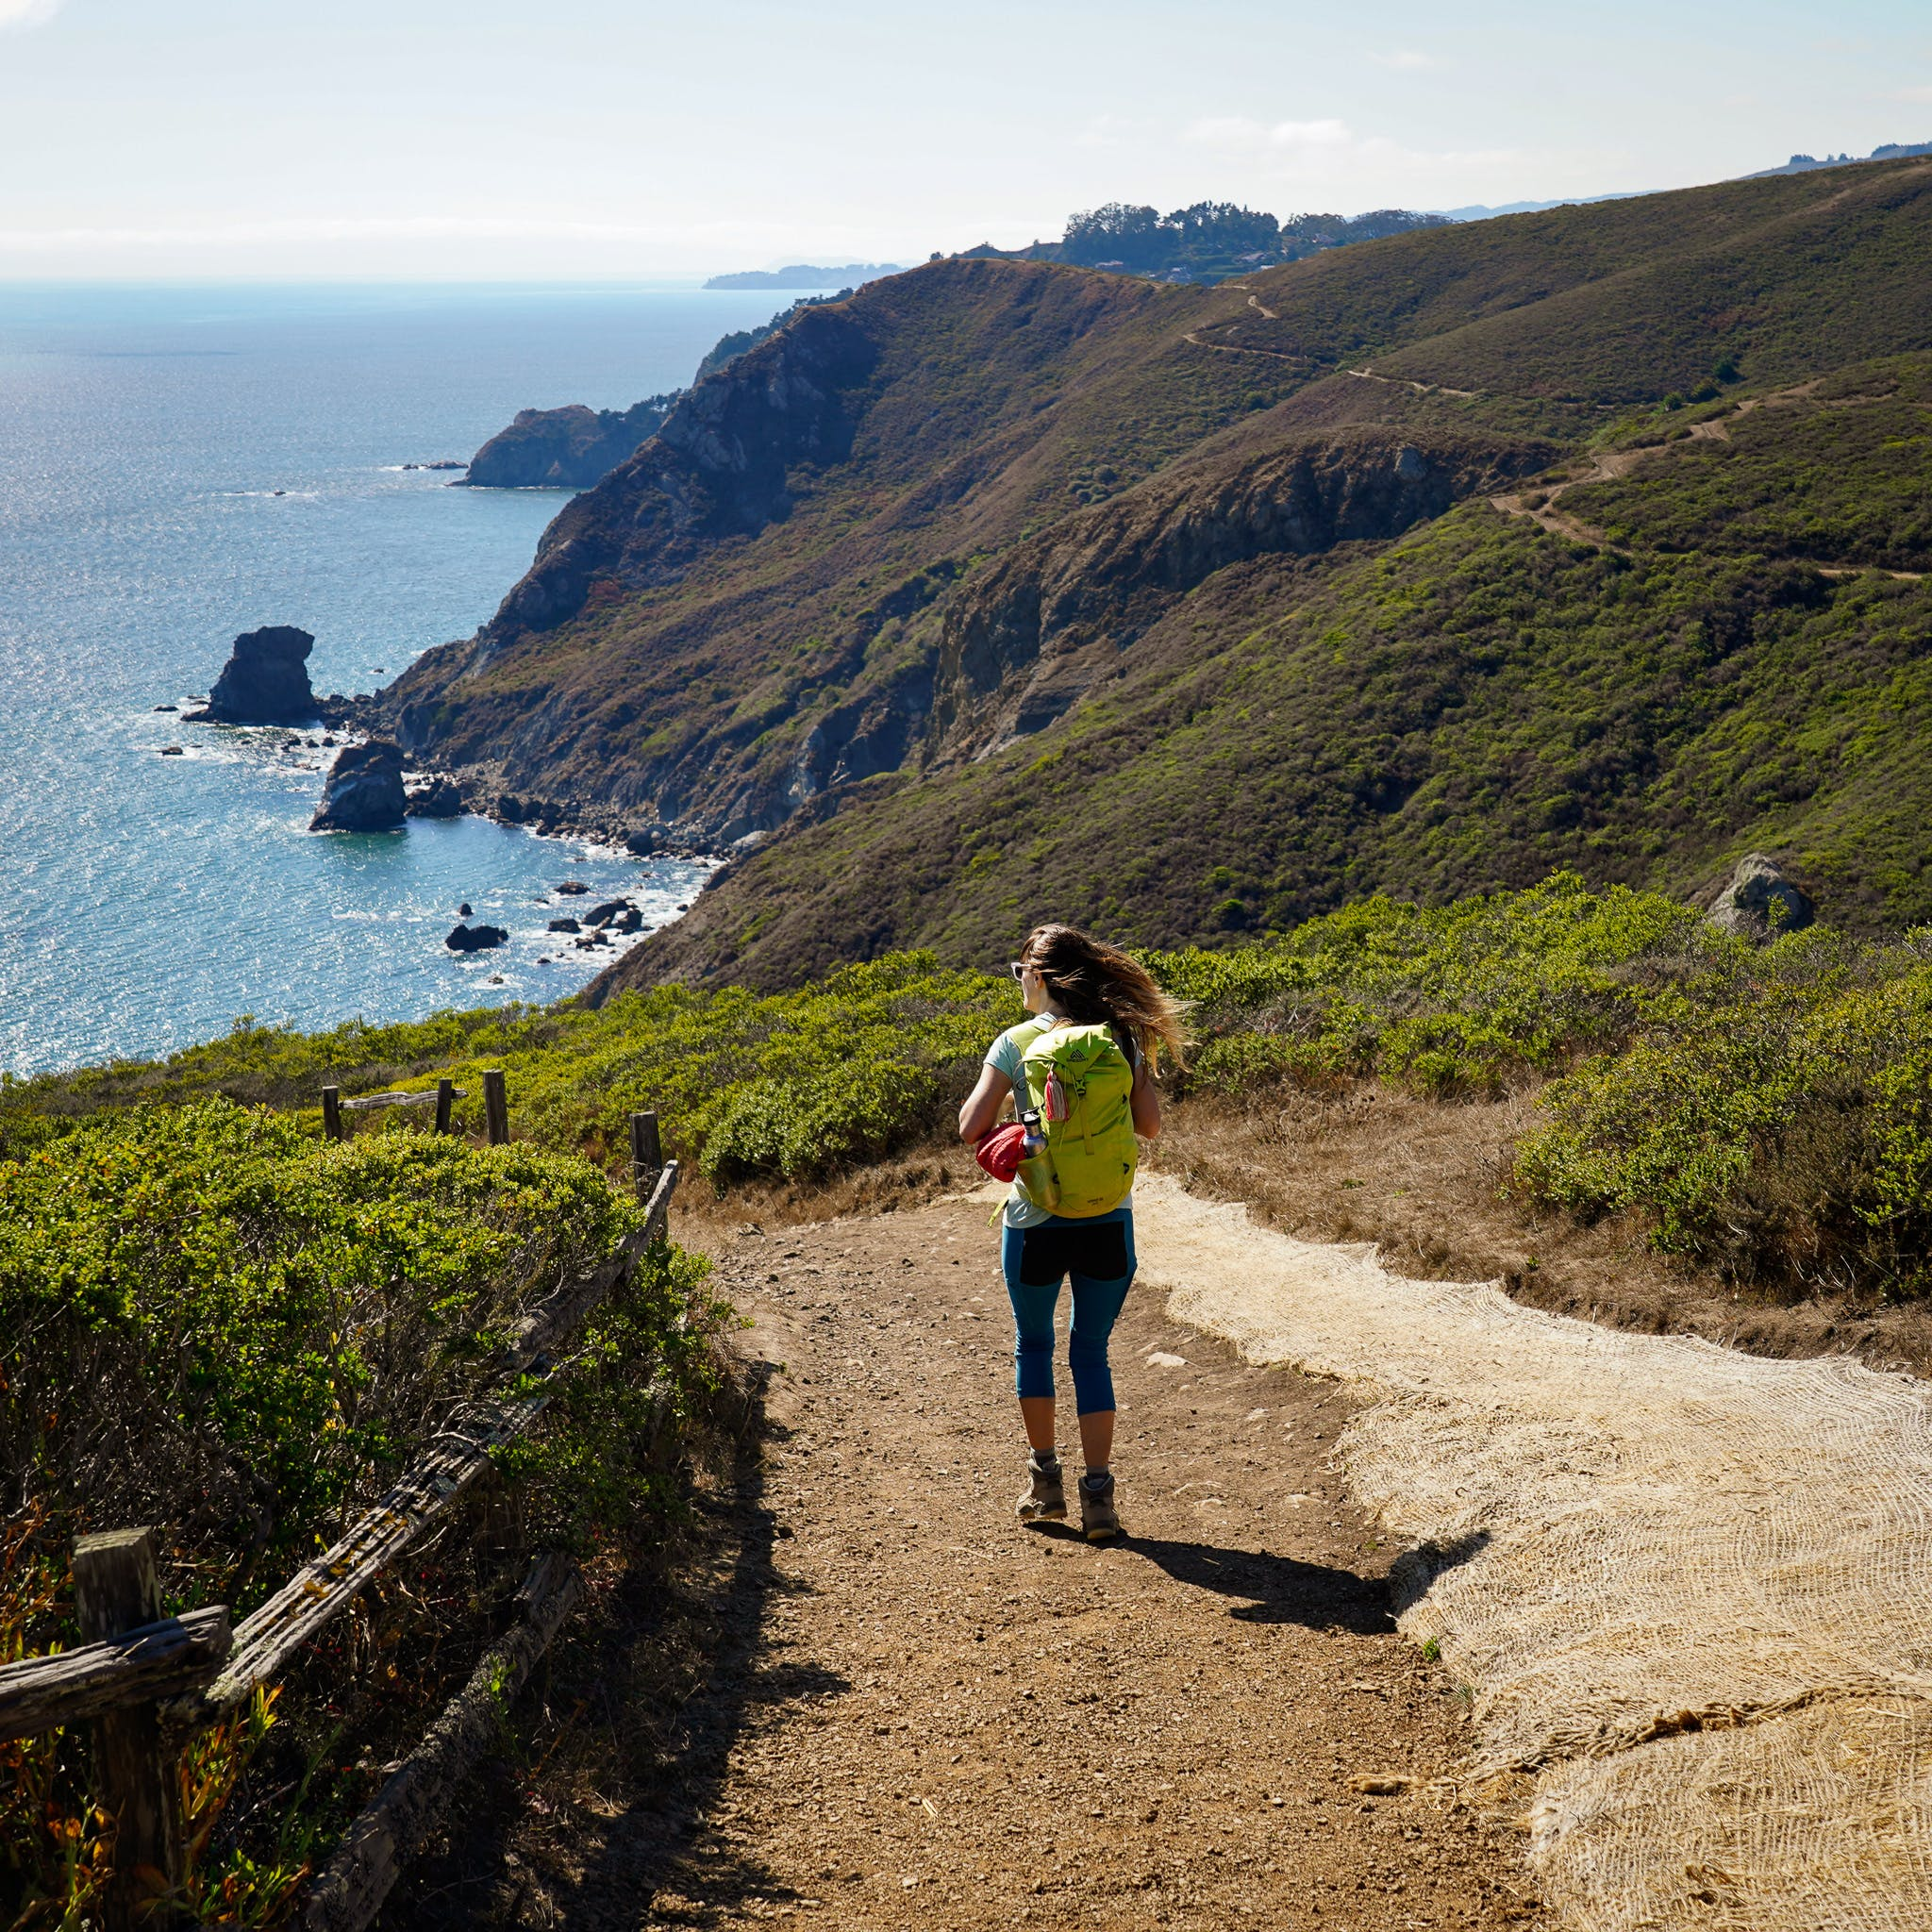 Woman hiking down the Coastal Trail in the Marin Headlands